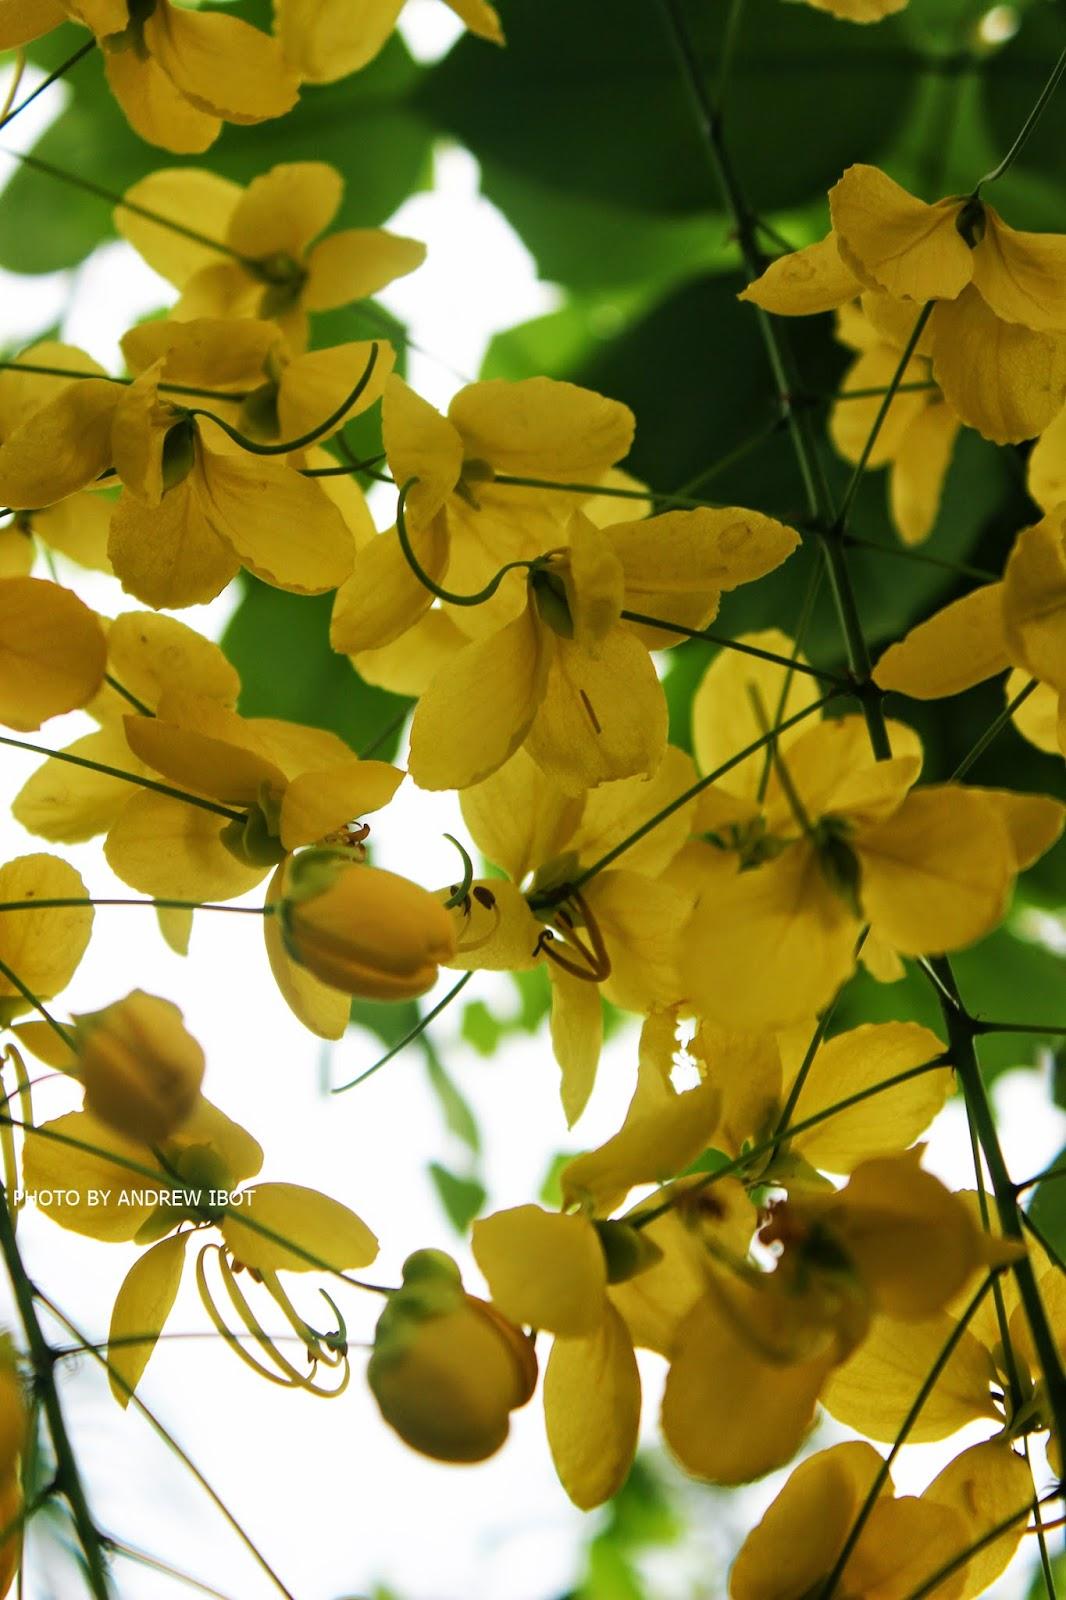 Halamang Gamot / Herbal Medicine - Kanya Pistula (Cassia fistula L)